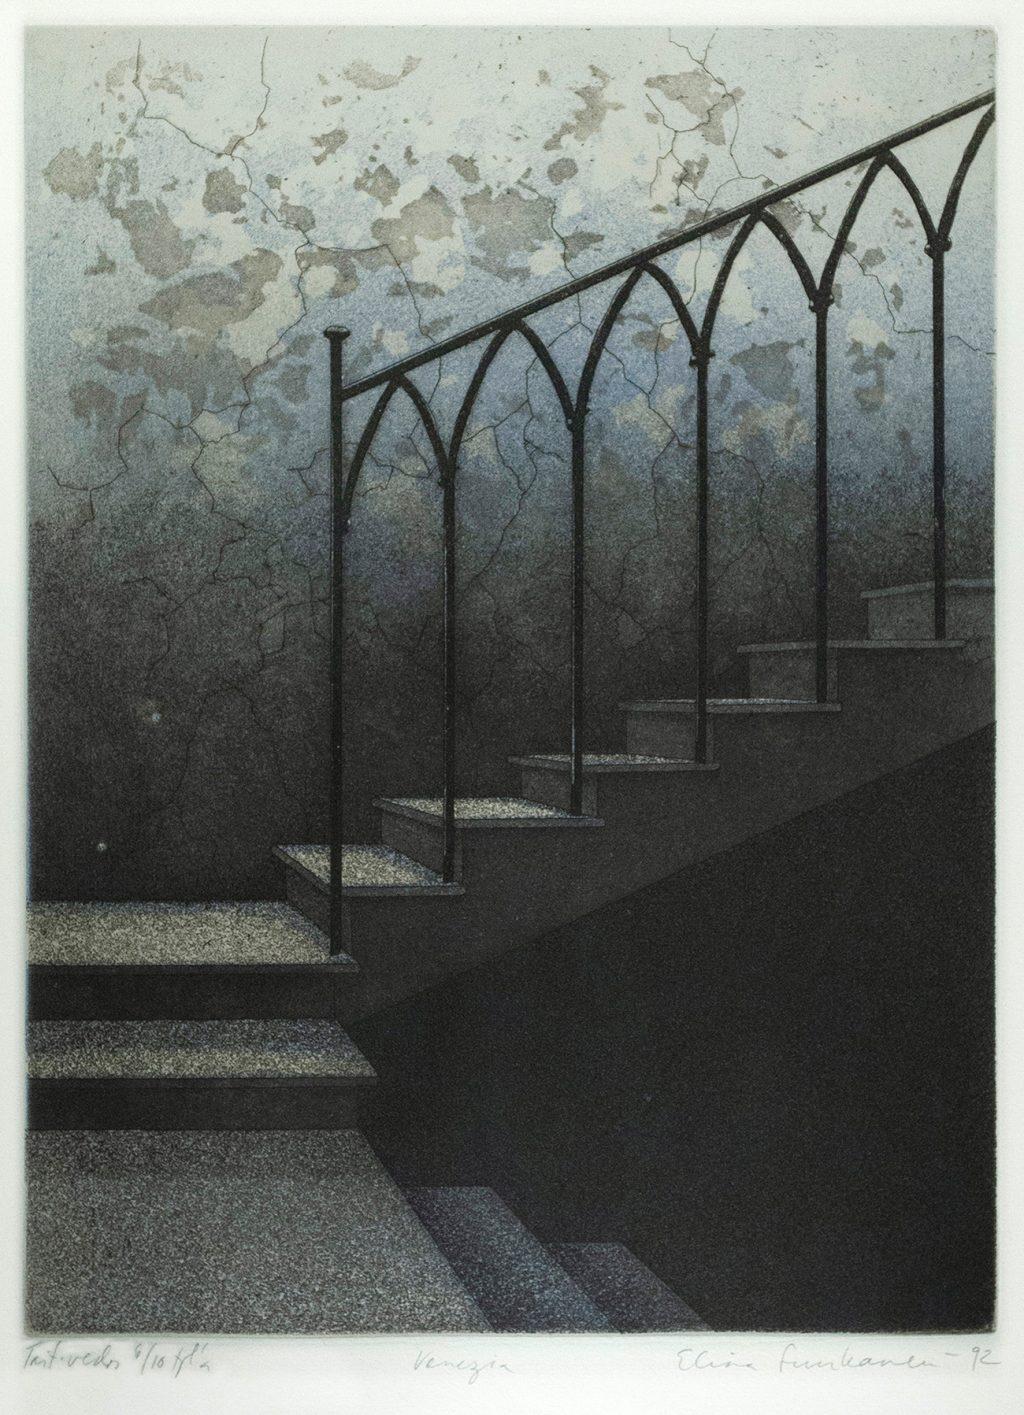 Kuva Elina Luukasen teokseseta Venezia (1992)